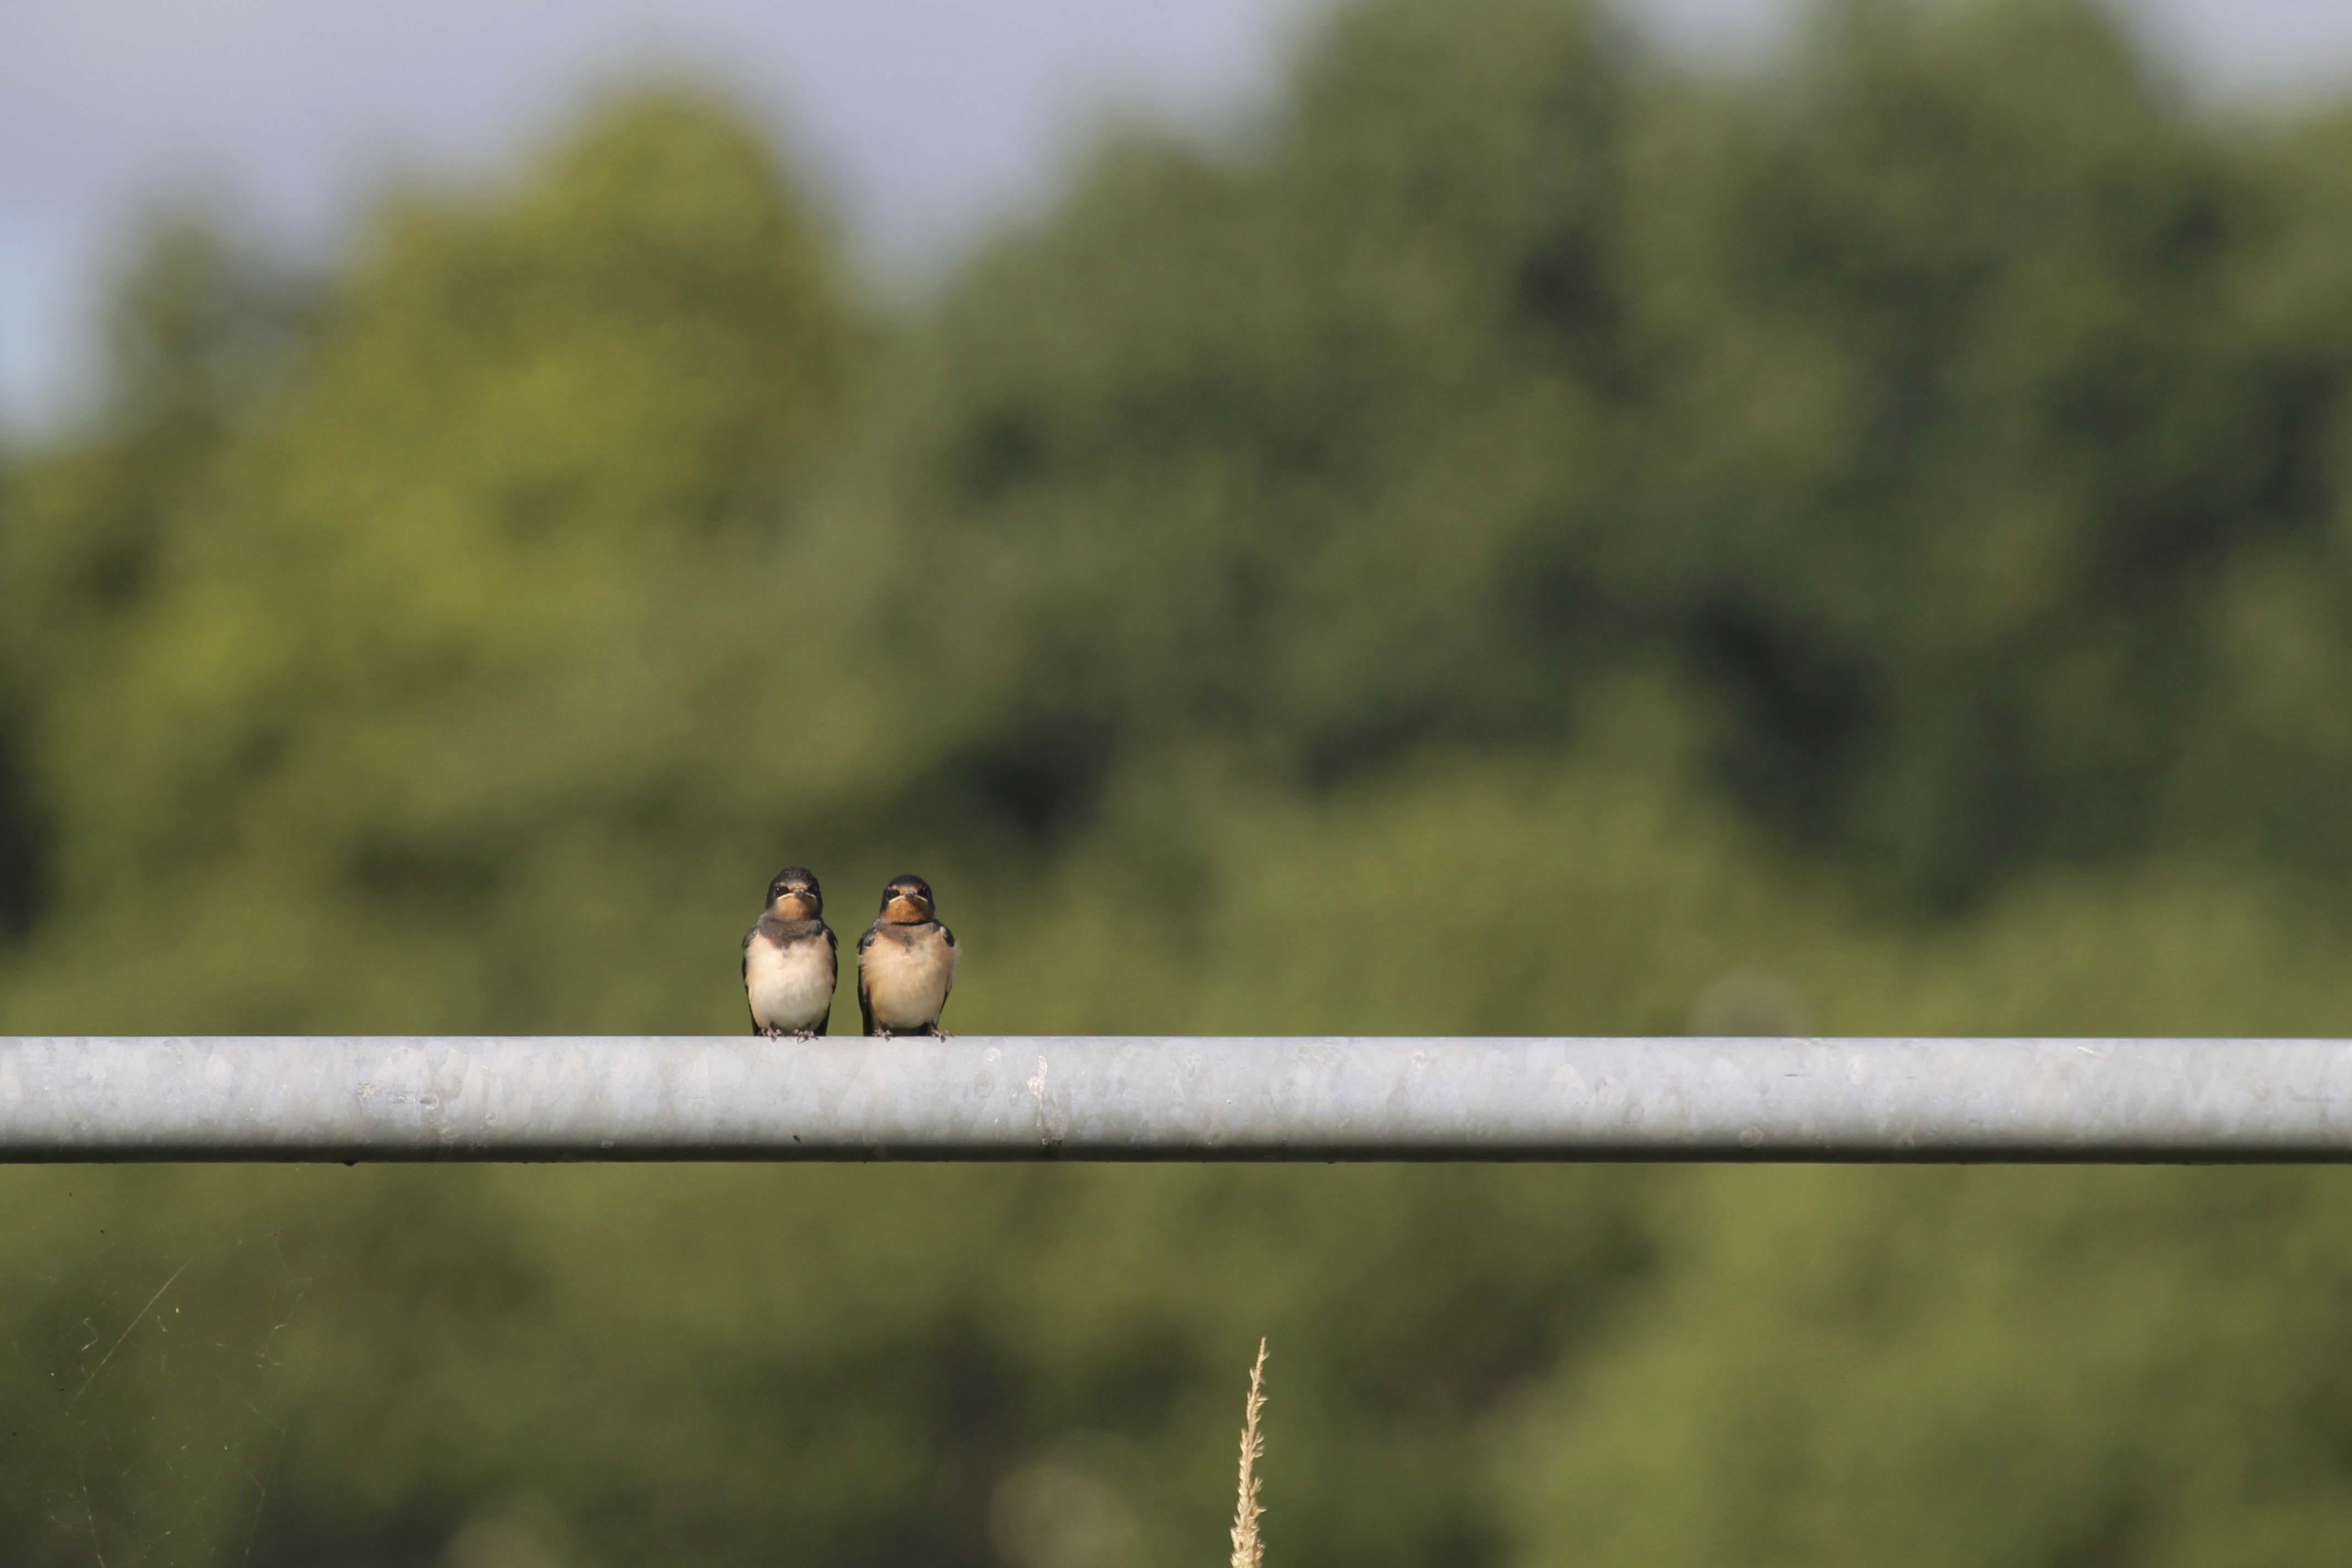 Jut en jul op een hekje